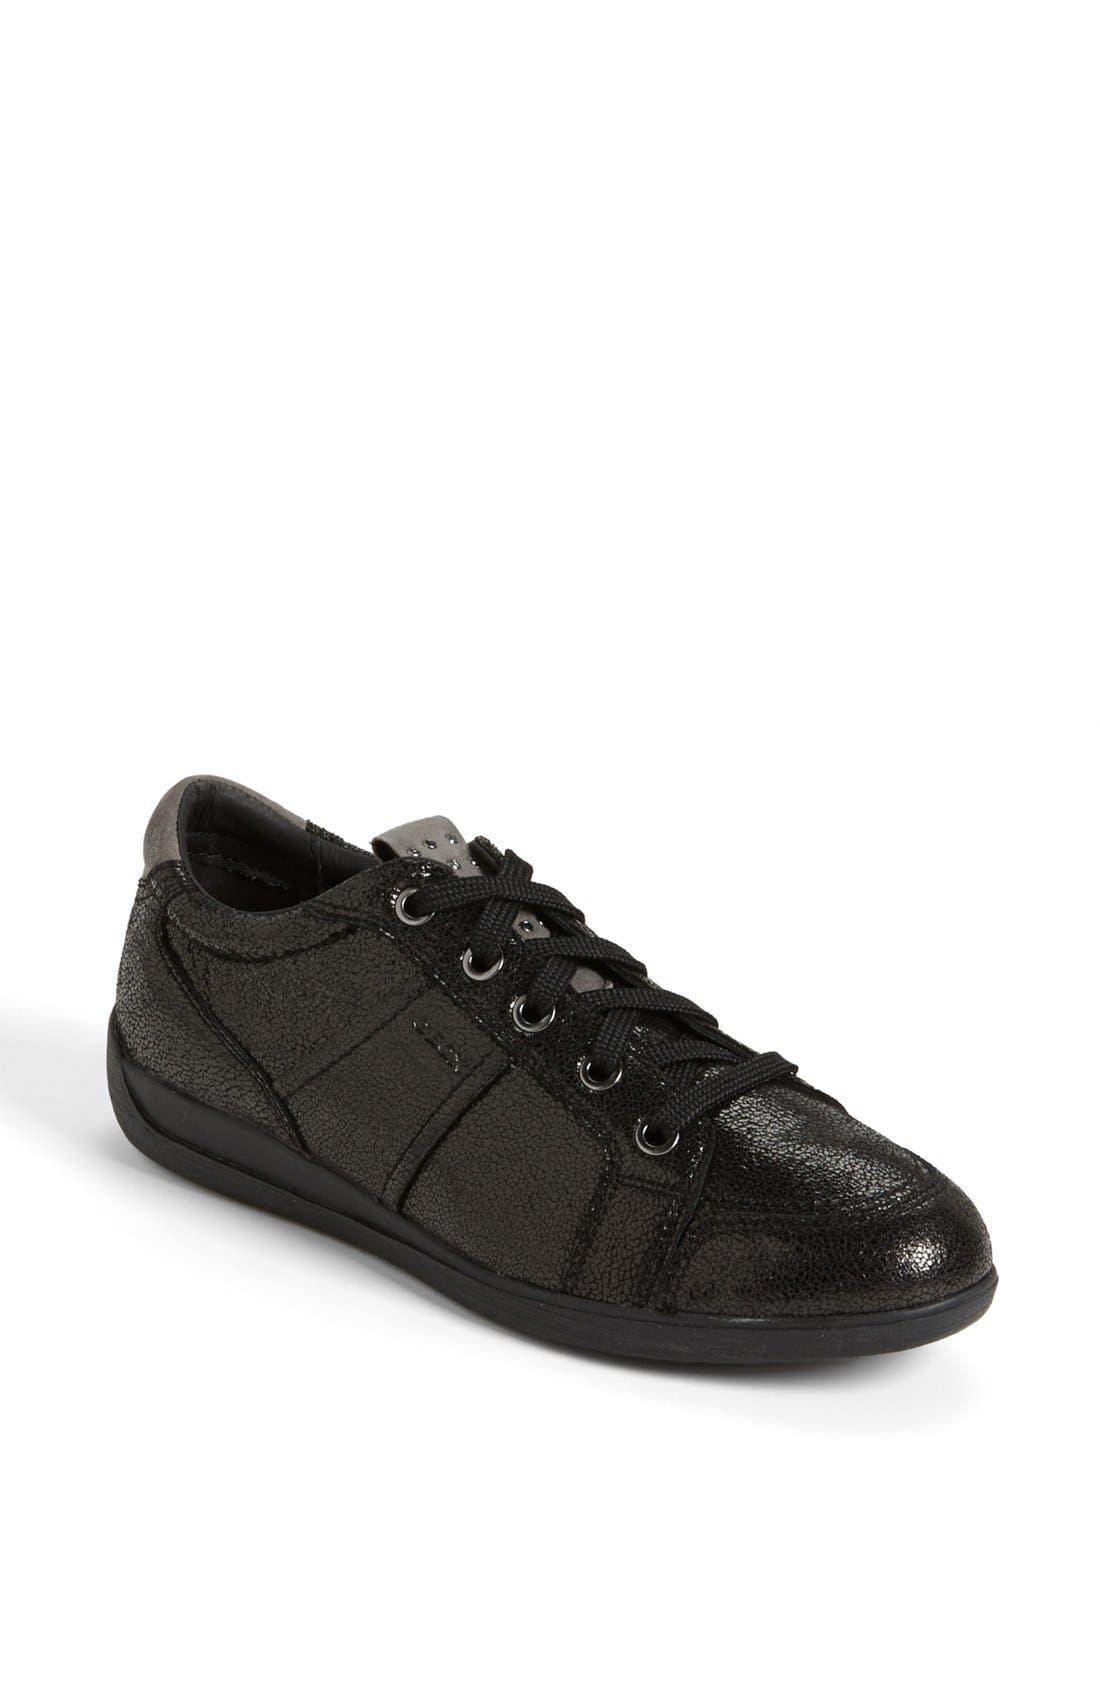 Main Image - Geox 'Myria' Sneaker